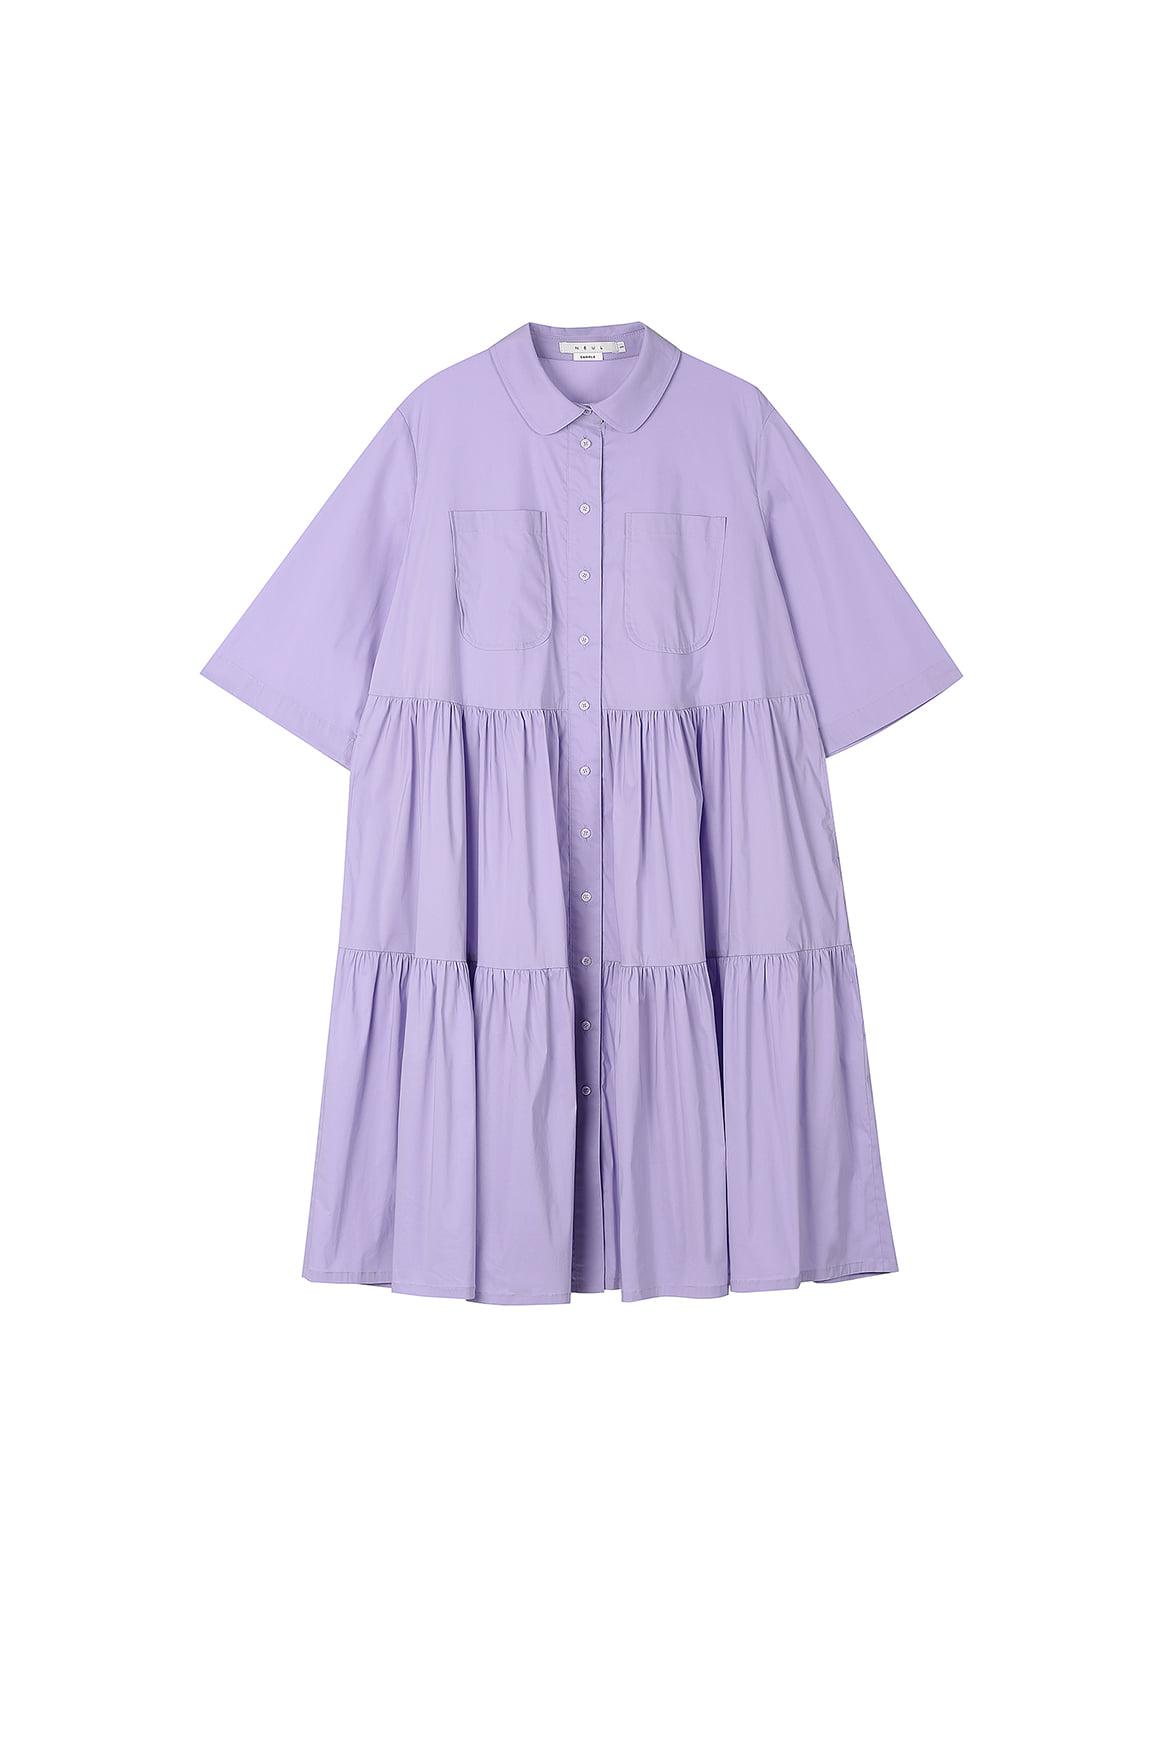 Lavender Tiered Shirtdress